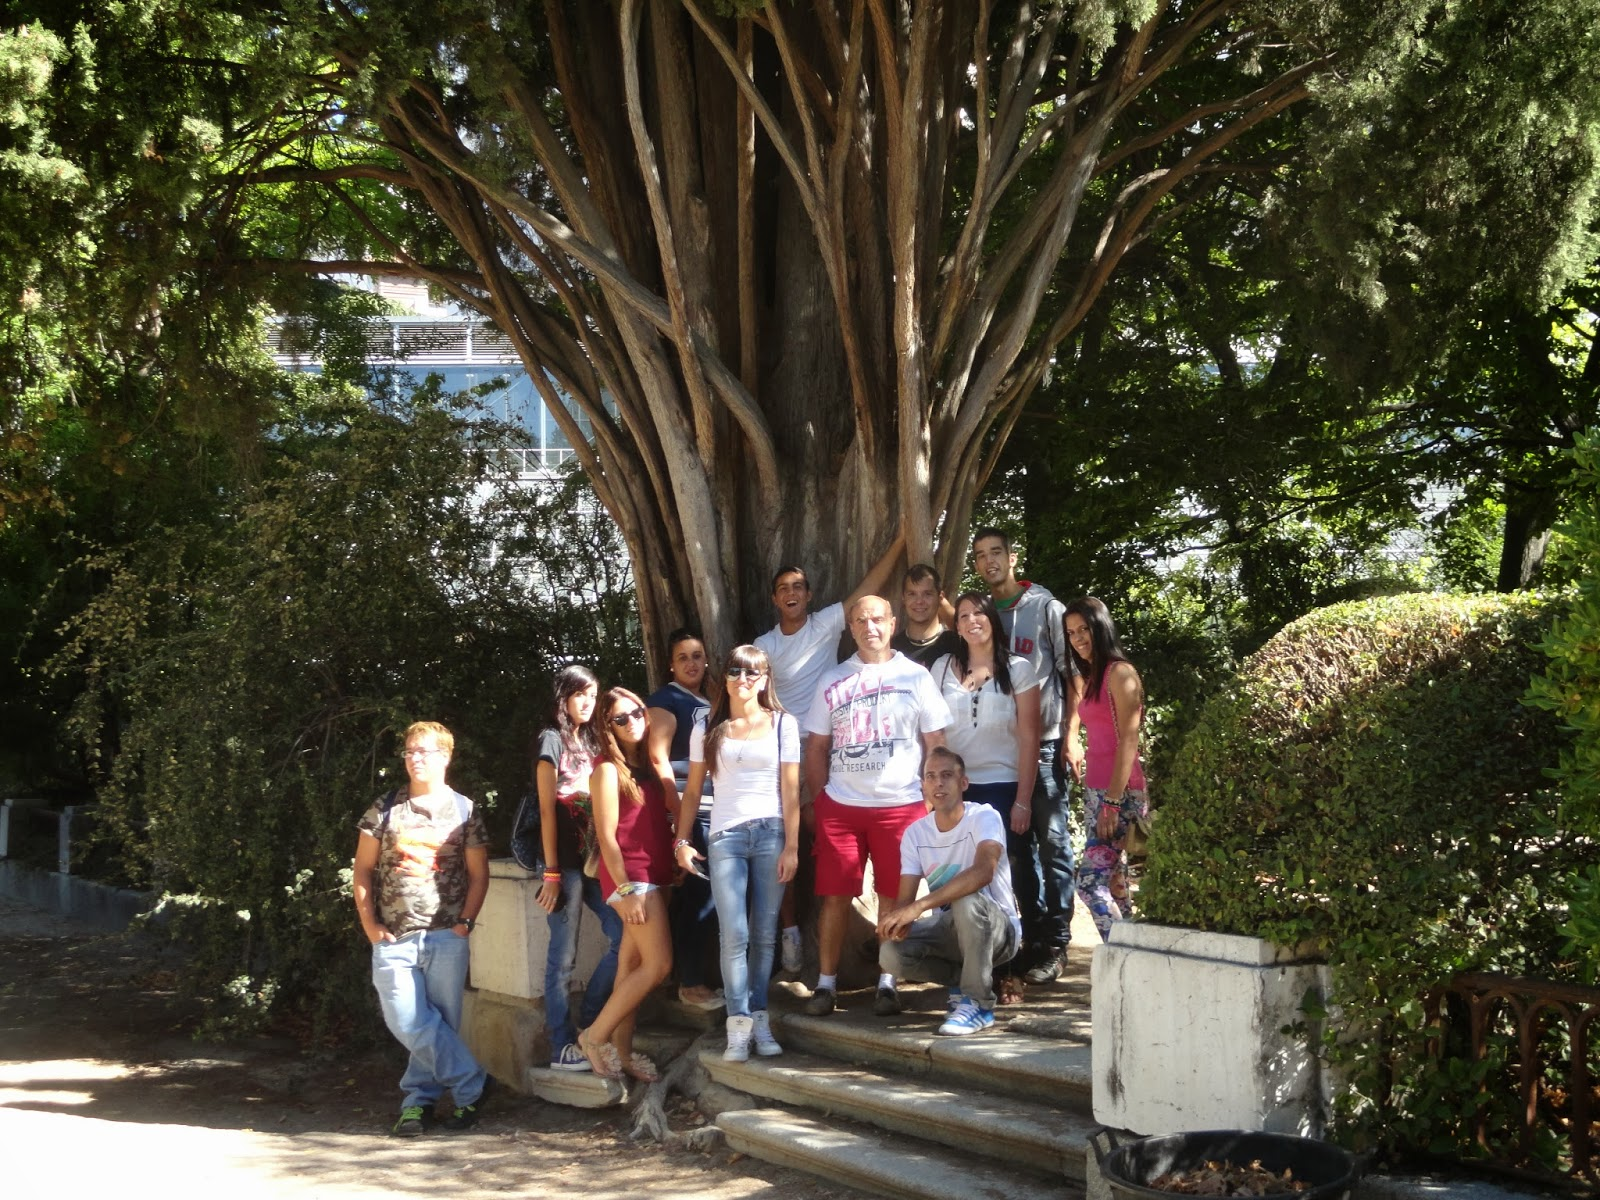 Escuela taller vicente paredes x jardin bot nico for Jardin botanico talleres